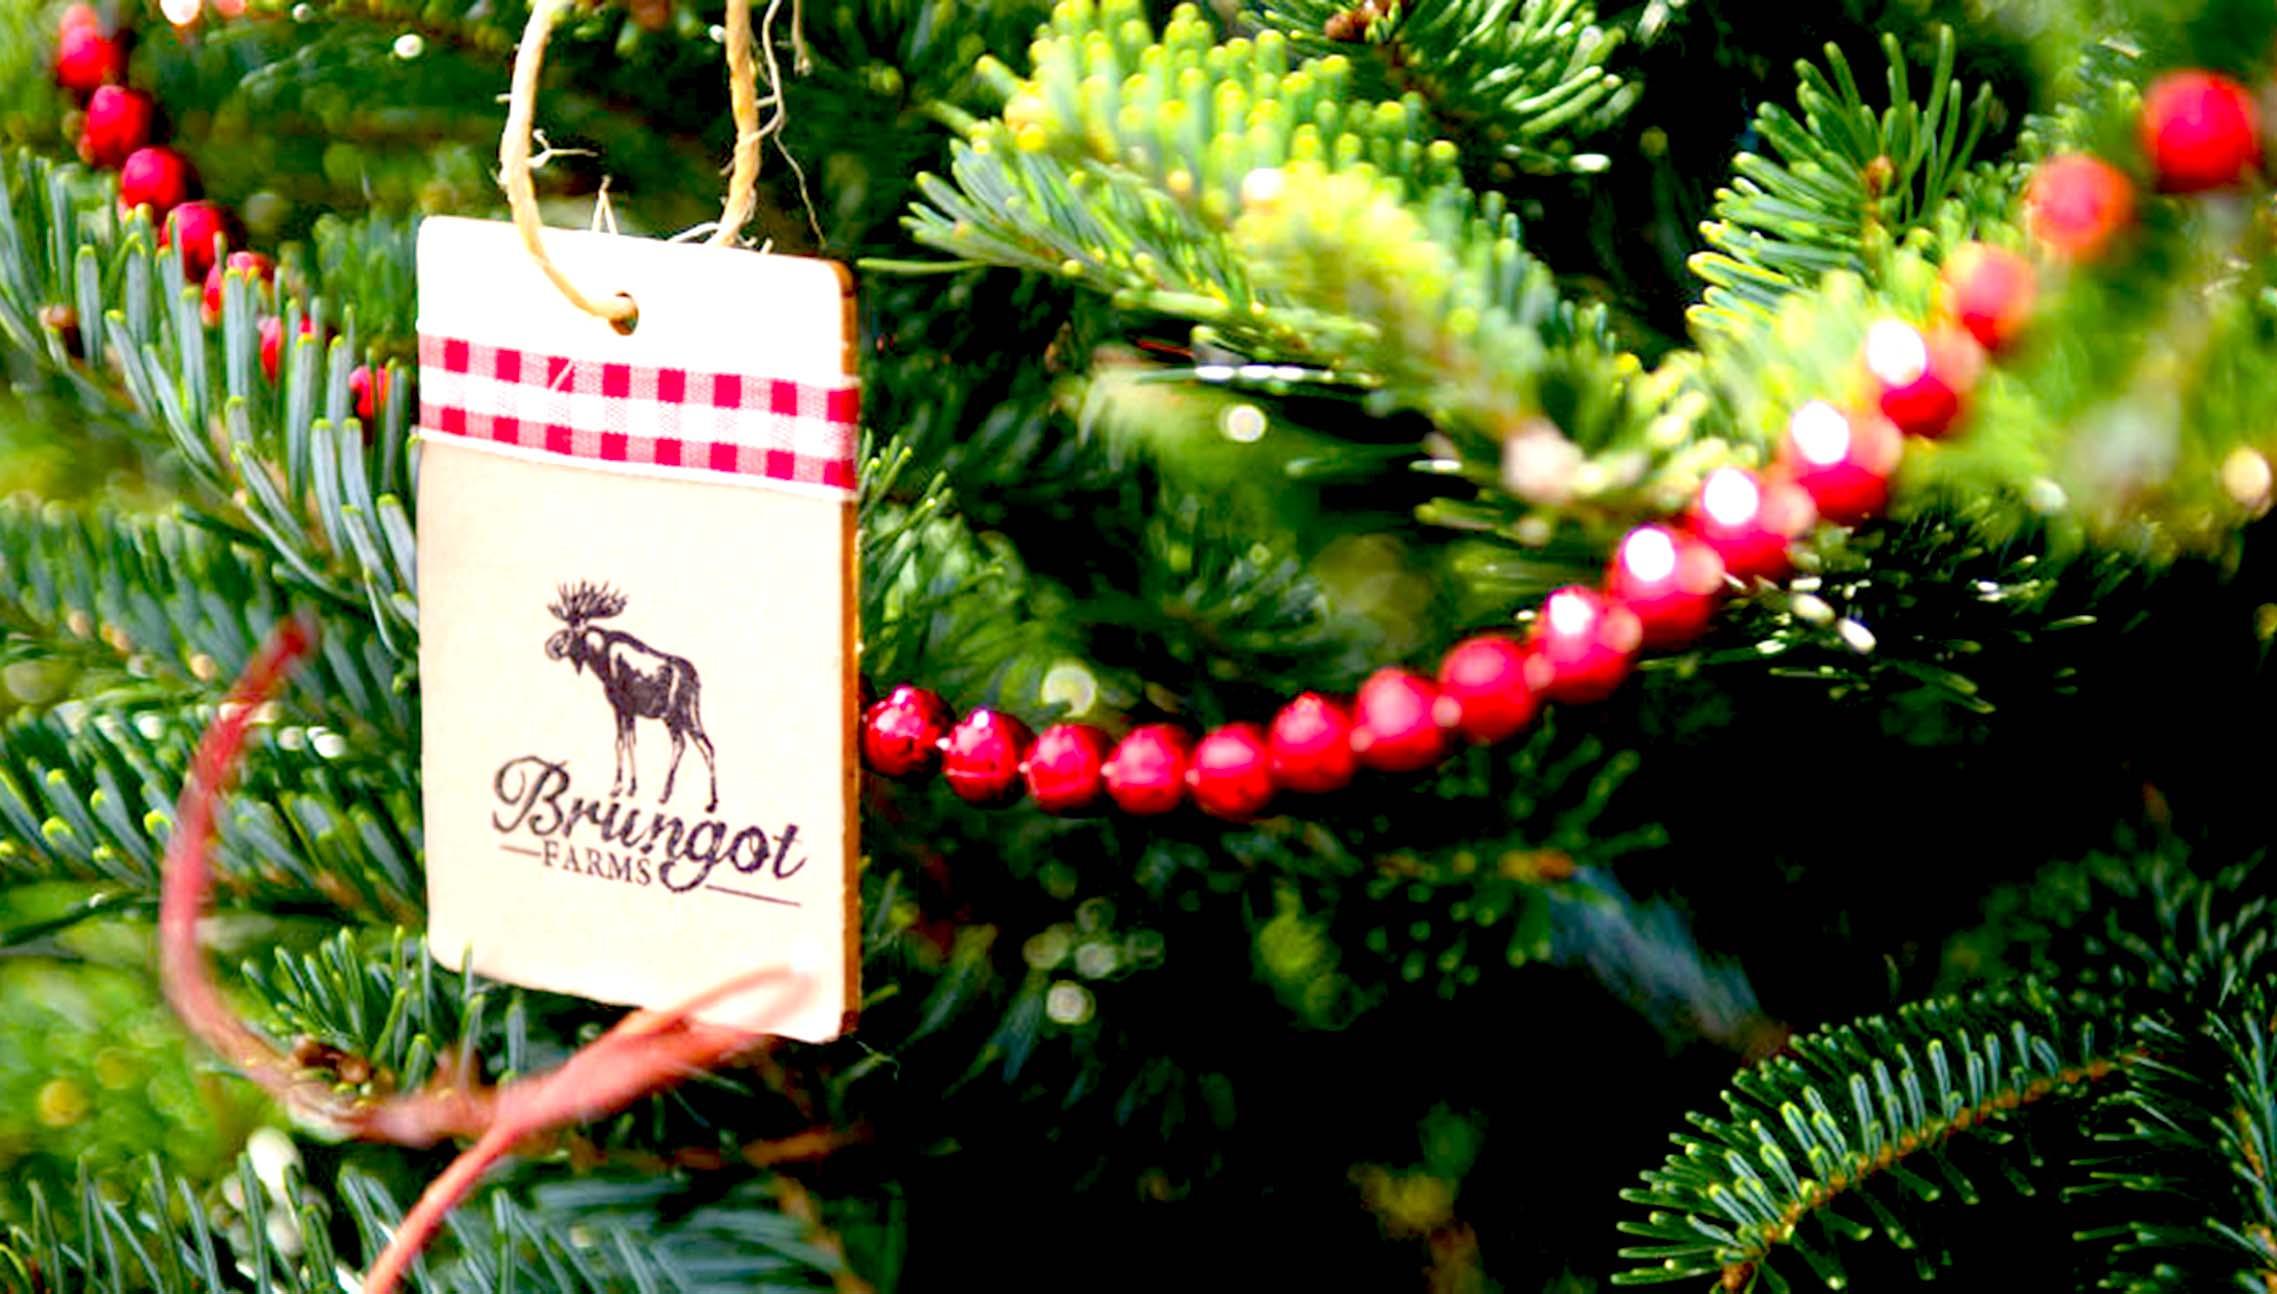 Image of Brungot Farms Christmas Trees